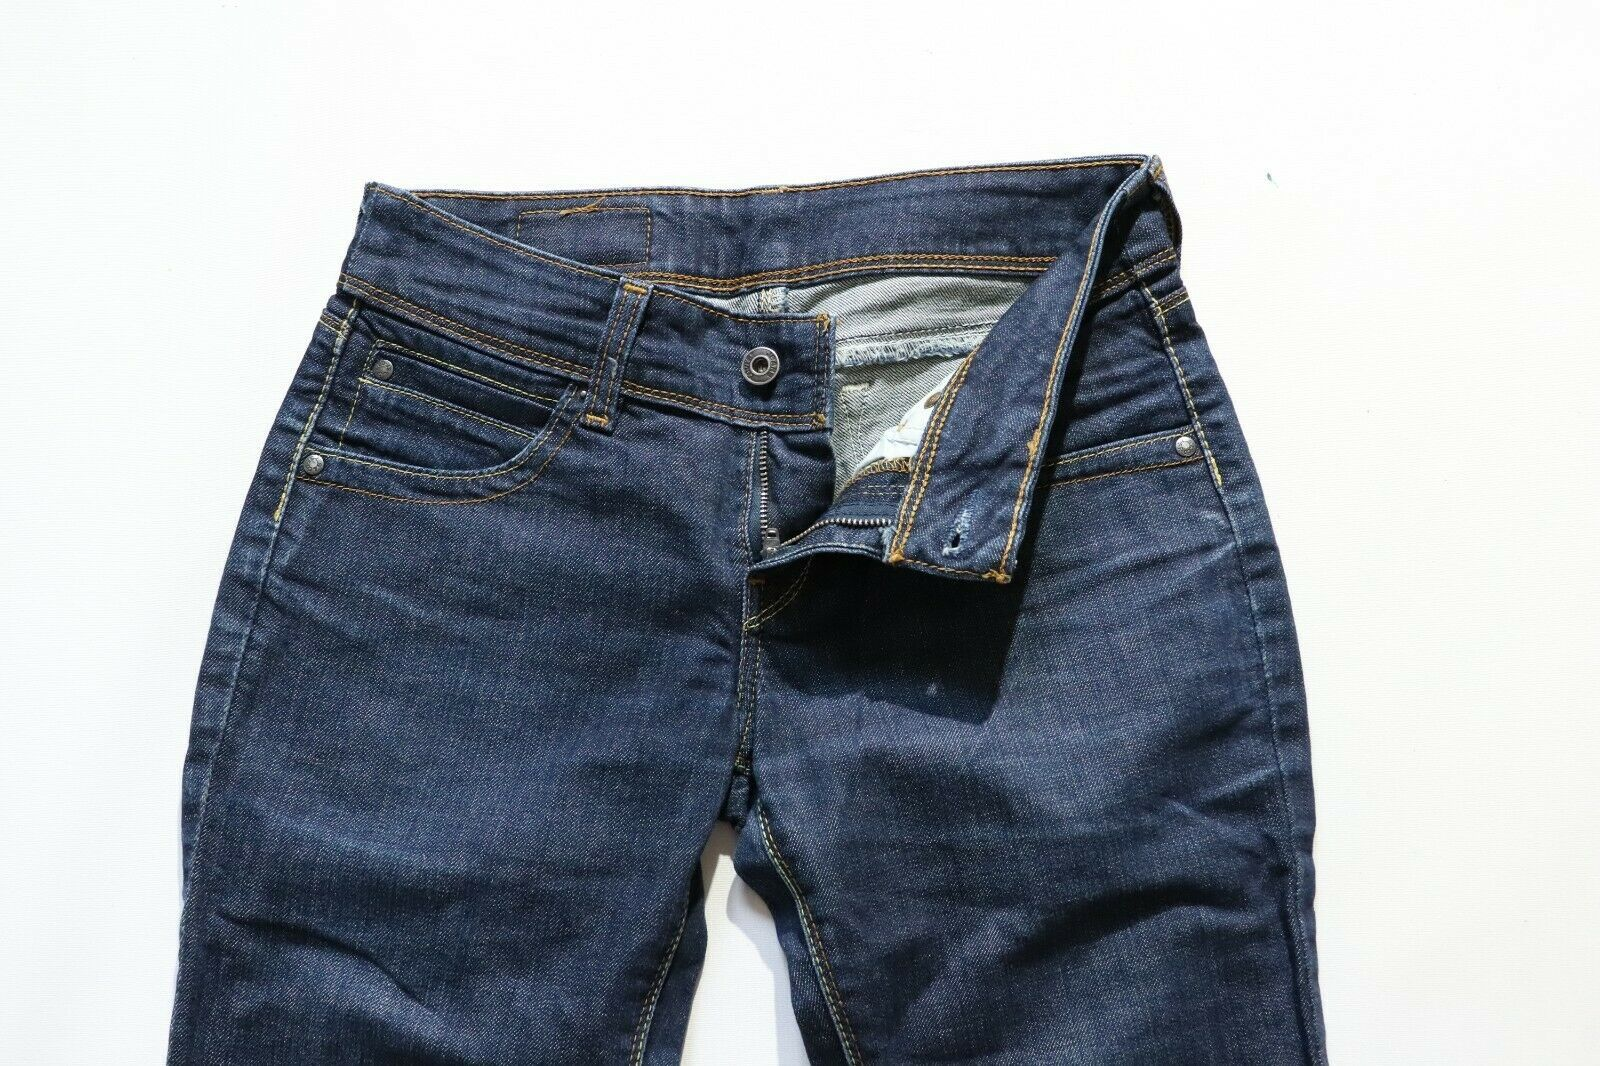 "Women's Vintage LEVI'S 433 Zip Fly Stretch Blue Denim Shorts Size W28 L14"""